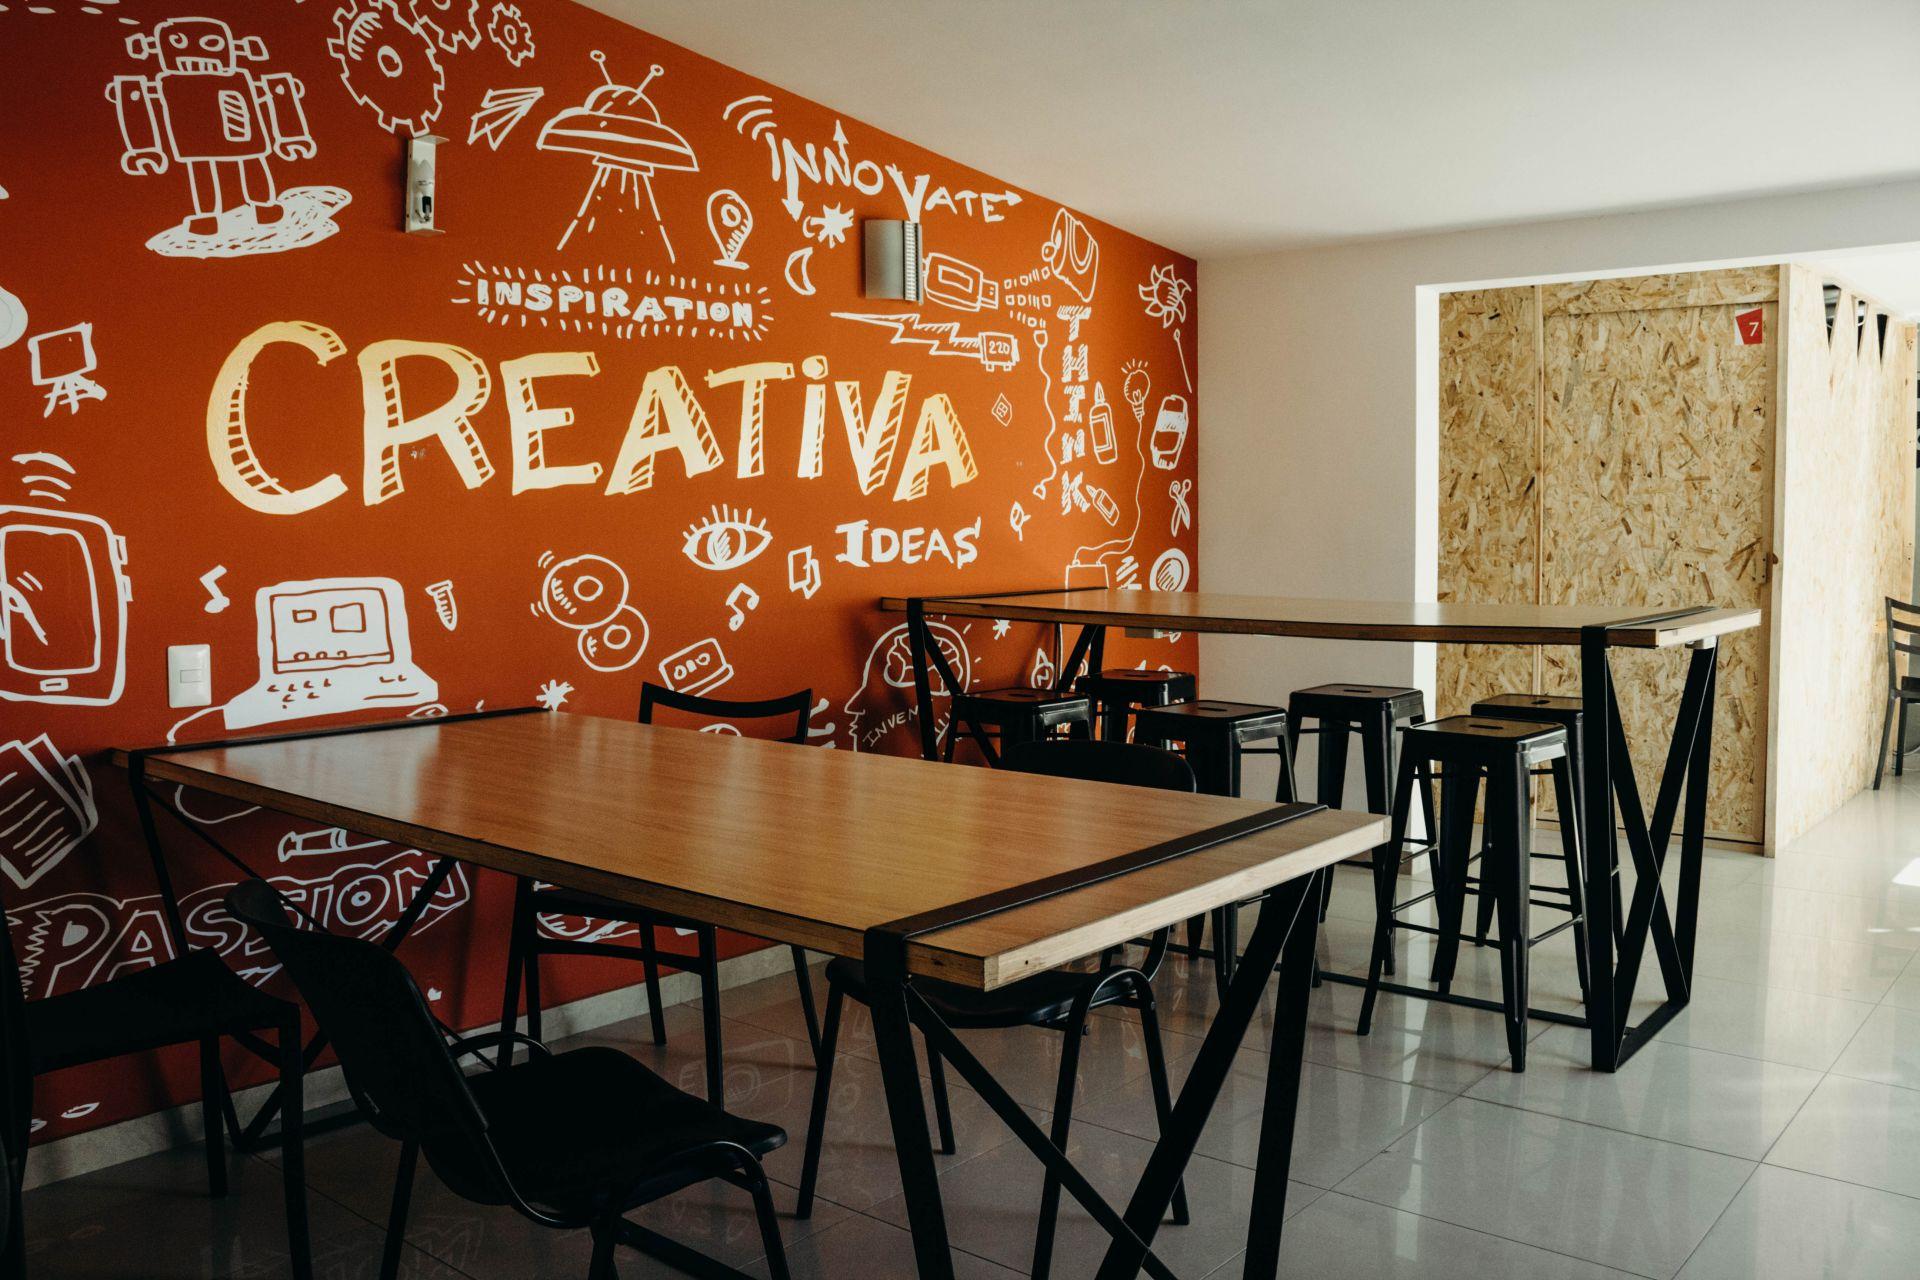 Creativa Coworking Morelia, Morelia